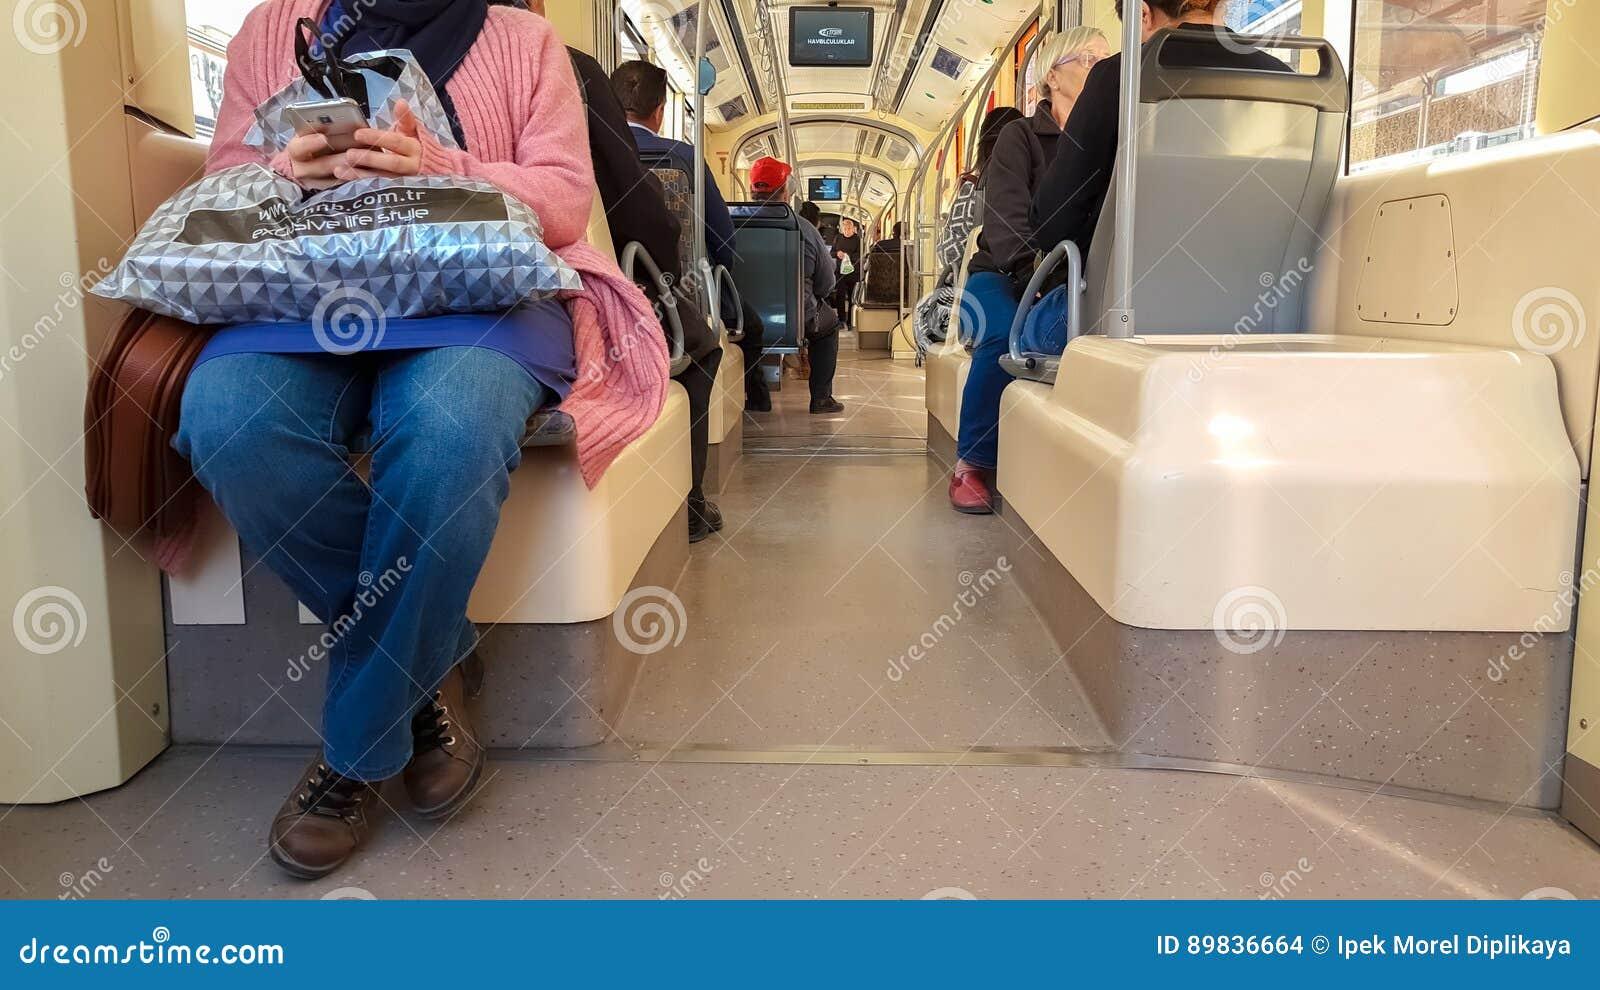 Eskisehir, Turkey - April 03, 2017: Passengers on Eskisehir tramway